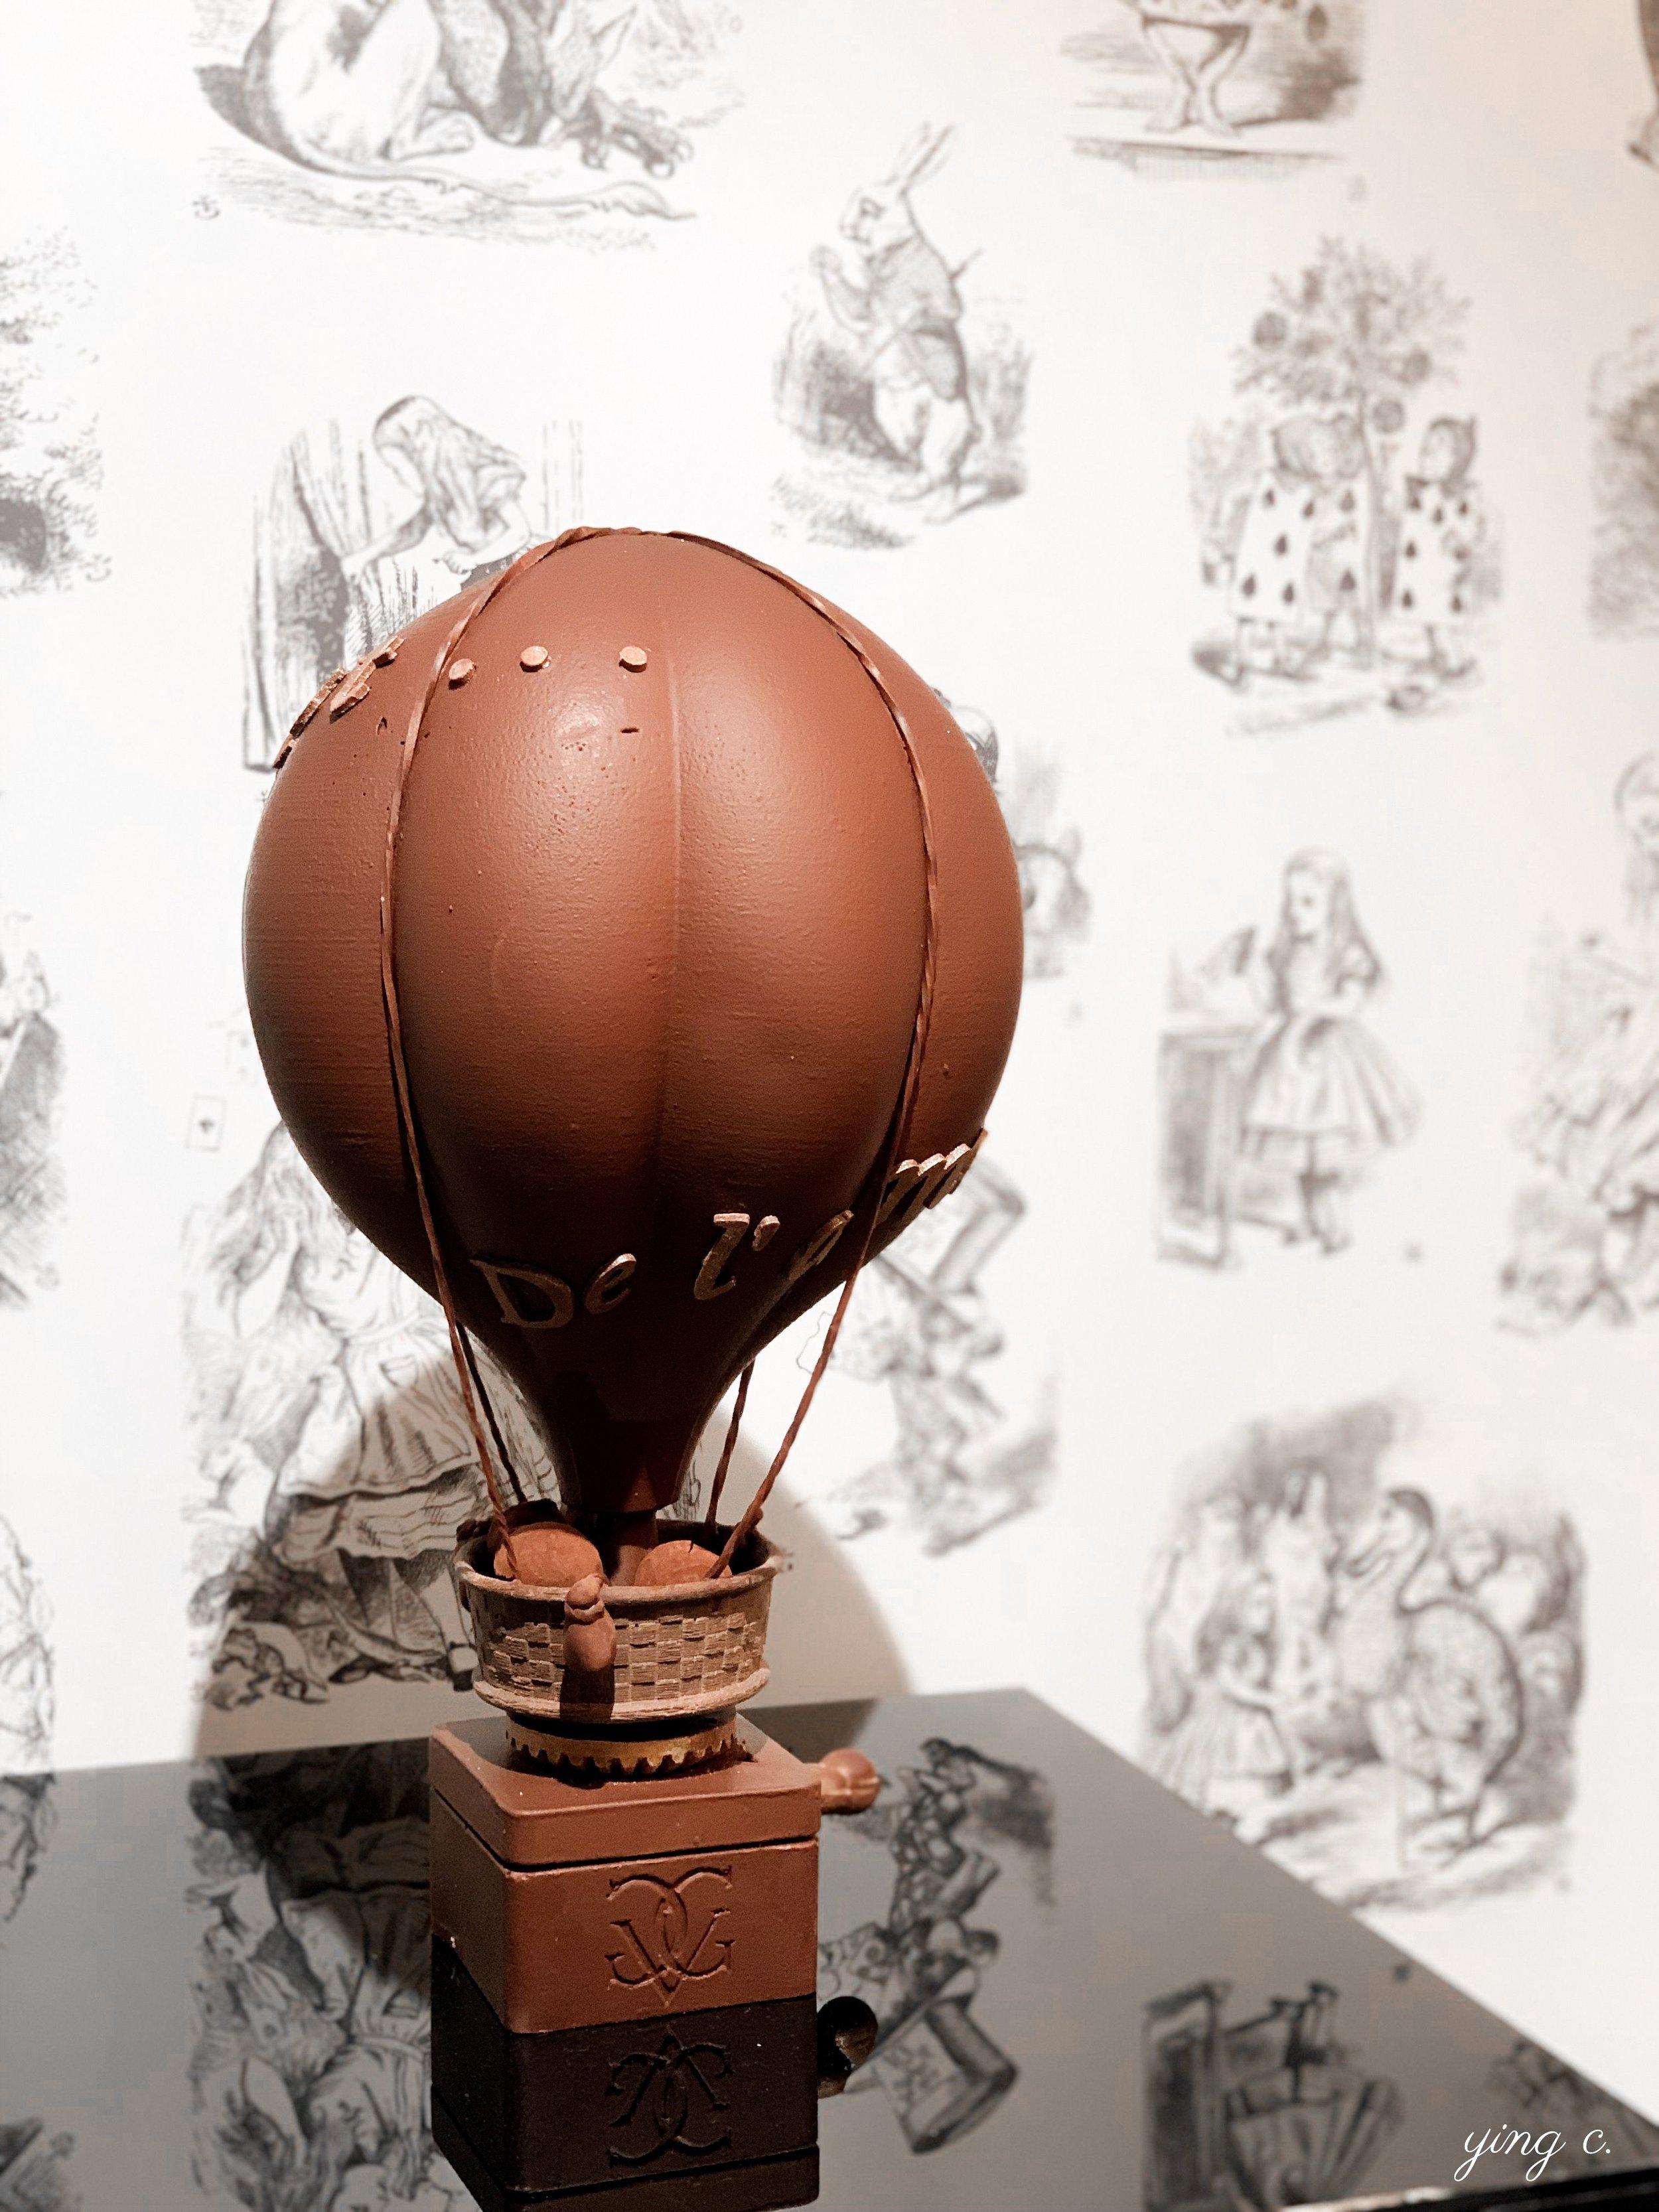 How tempting is this? / 造型精巧的巧克力熱氣球,你是不是也想帶一個回家呢?